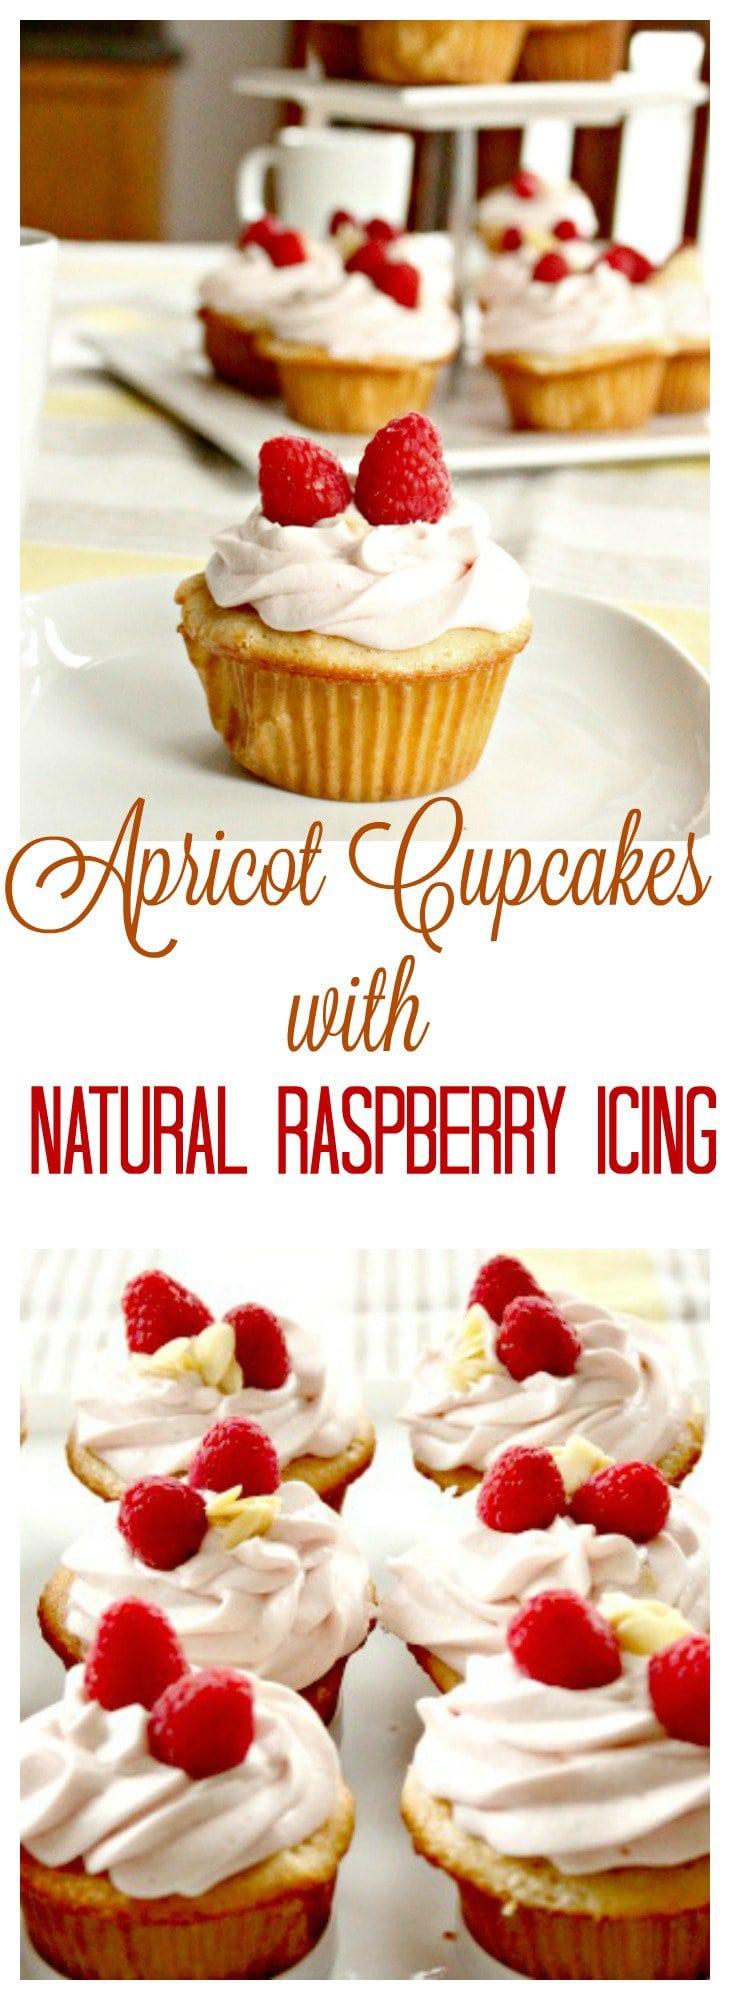 Cupcake Recipe, Apricot Cupcake, Apricot Raspberry Cupcake, Raspberry Cupcake, Baking Recipe, Spring Cupcakes, Easter Cupcakes, All natural cupcakes, dye free cupcakes